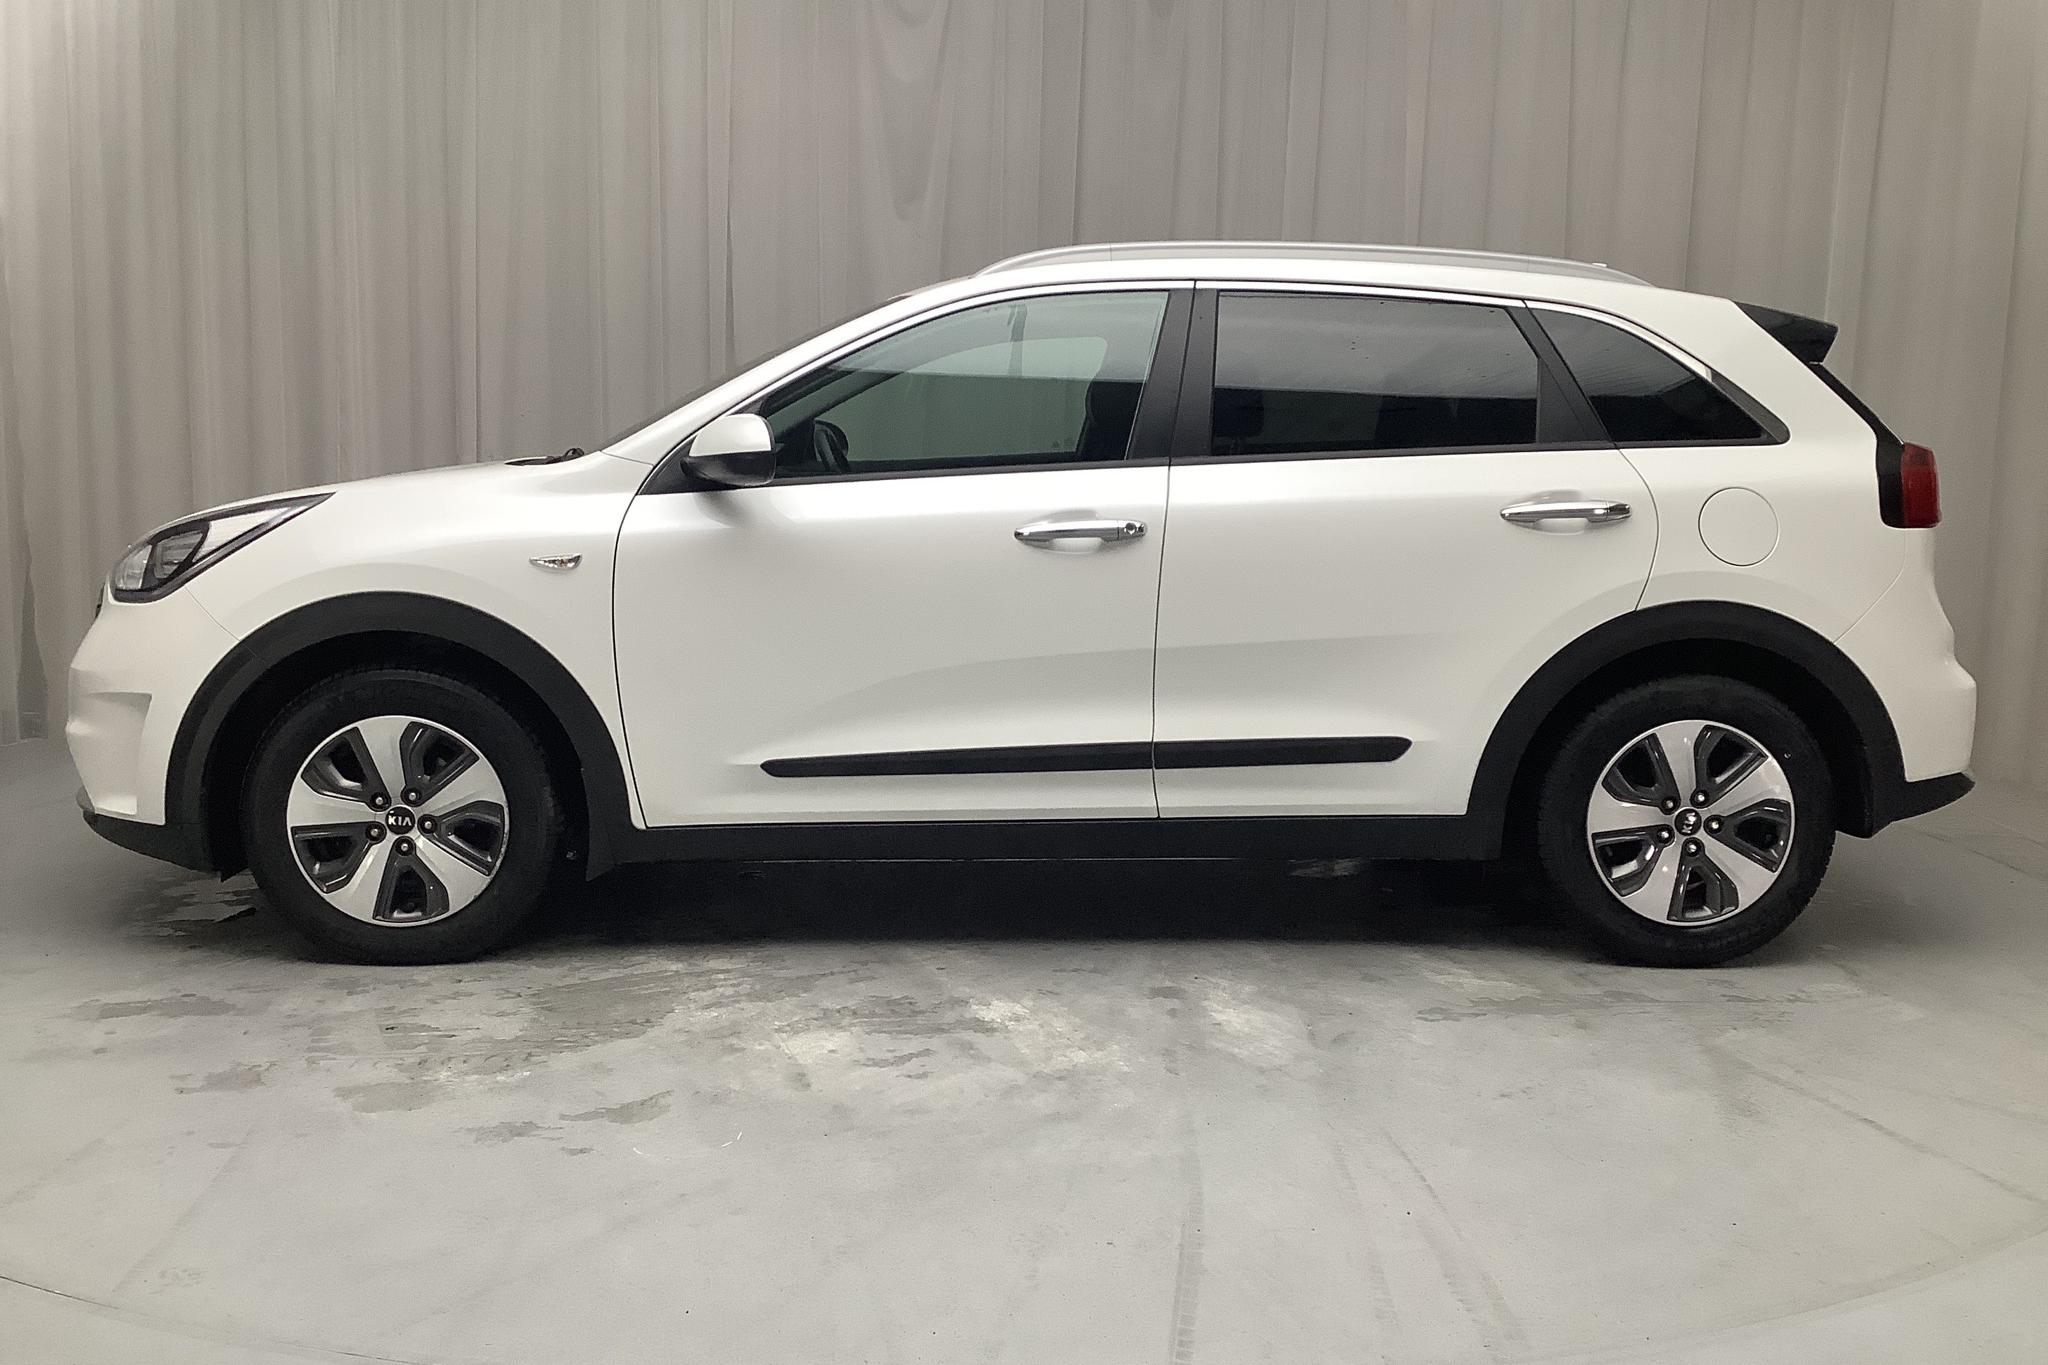 KIA Niro Hybrid 1.6 (141hk) - 80 980 km - Automatic - white - 2017